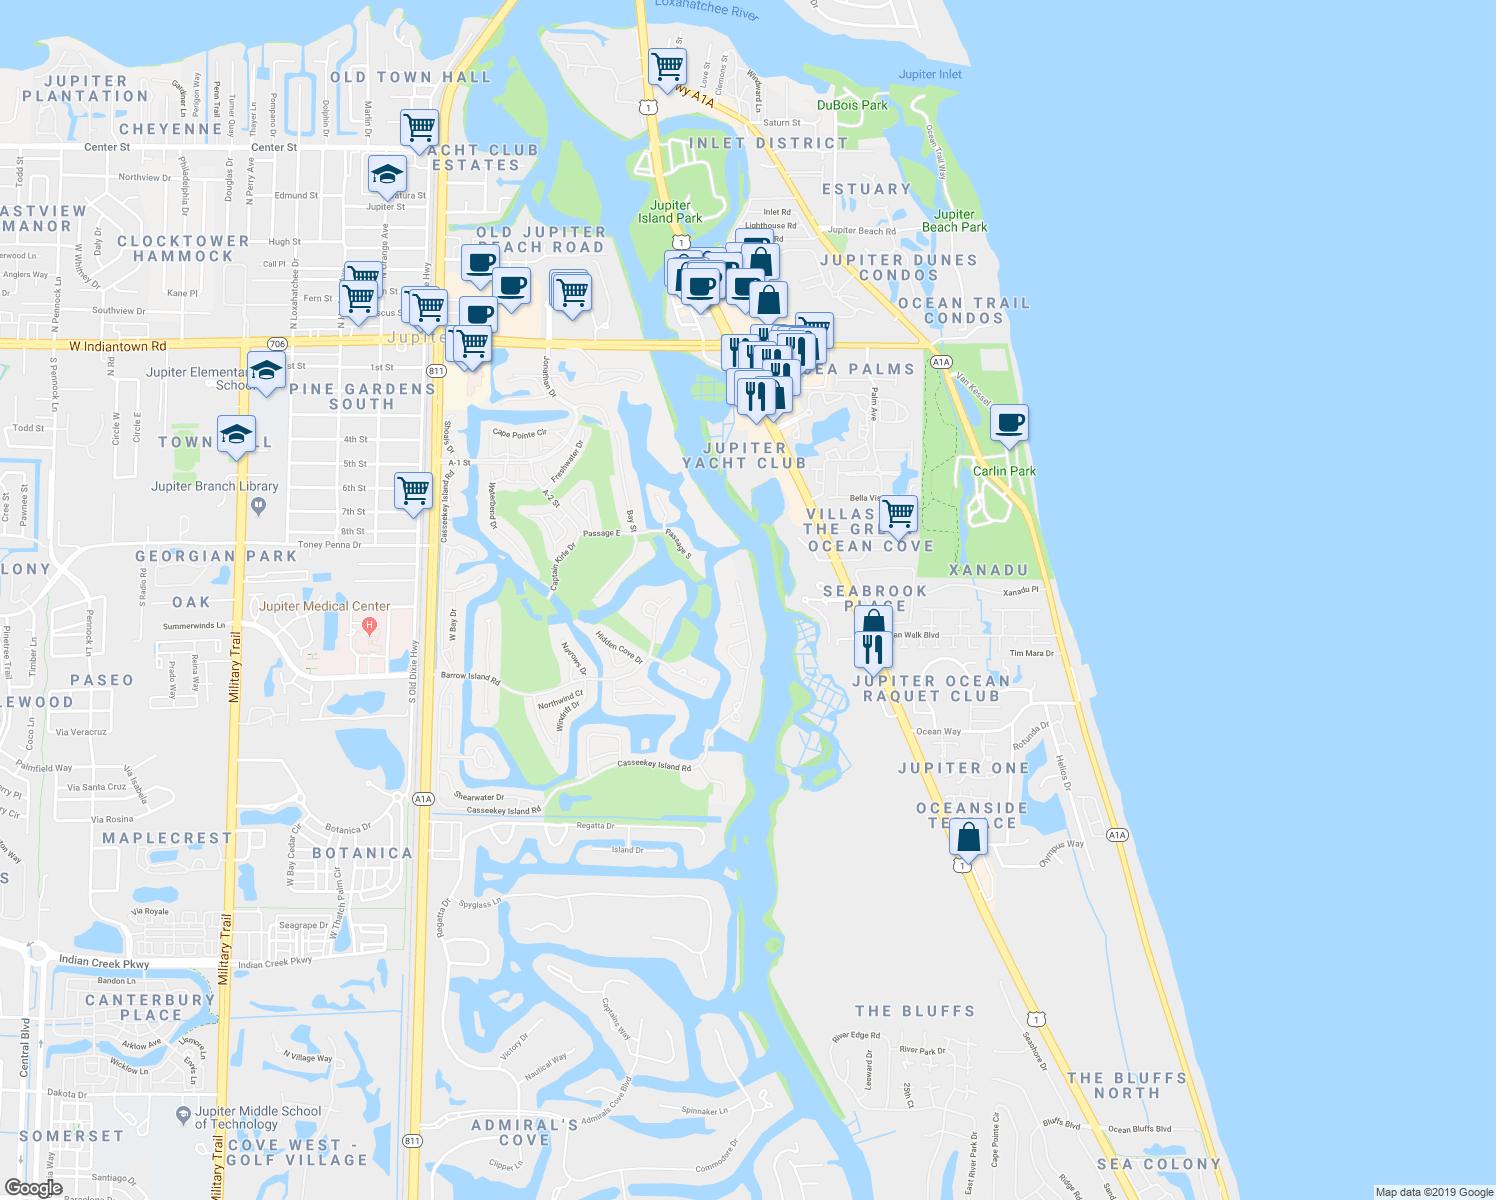 Jupiter Island Florida Map | Www.picsbud - Jupiter Island Florida Map